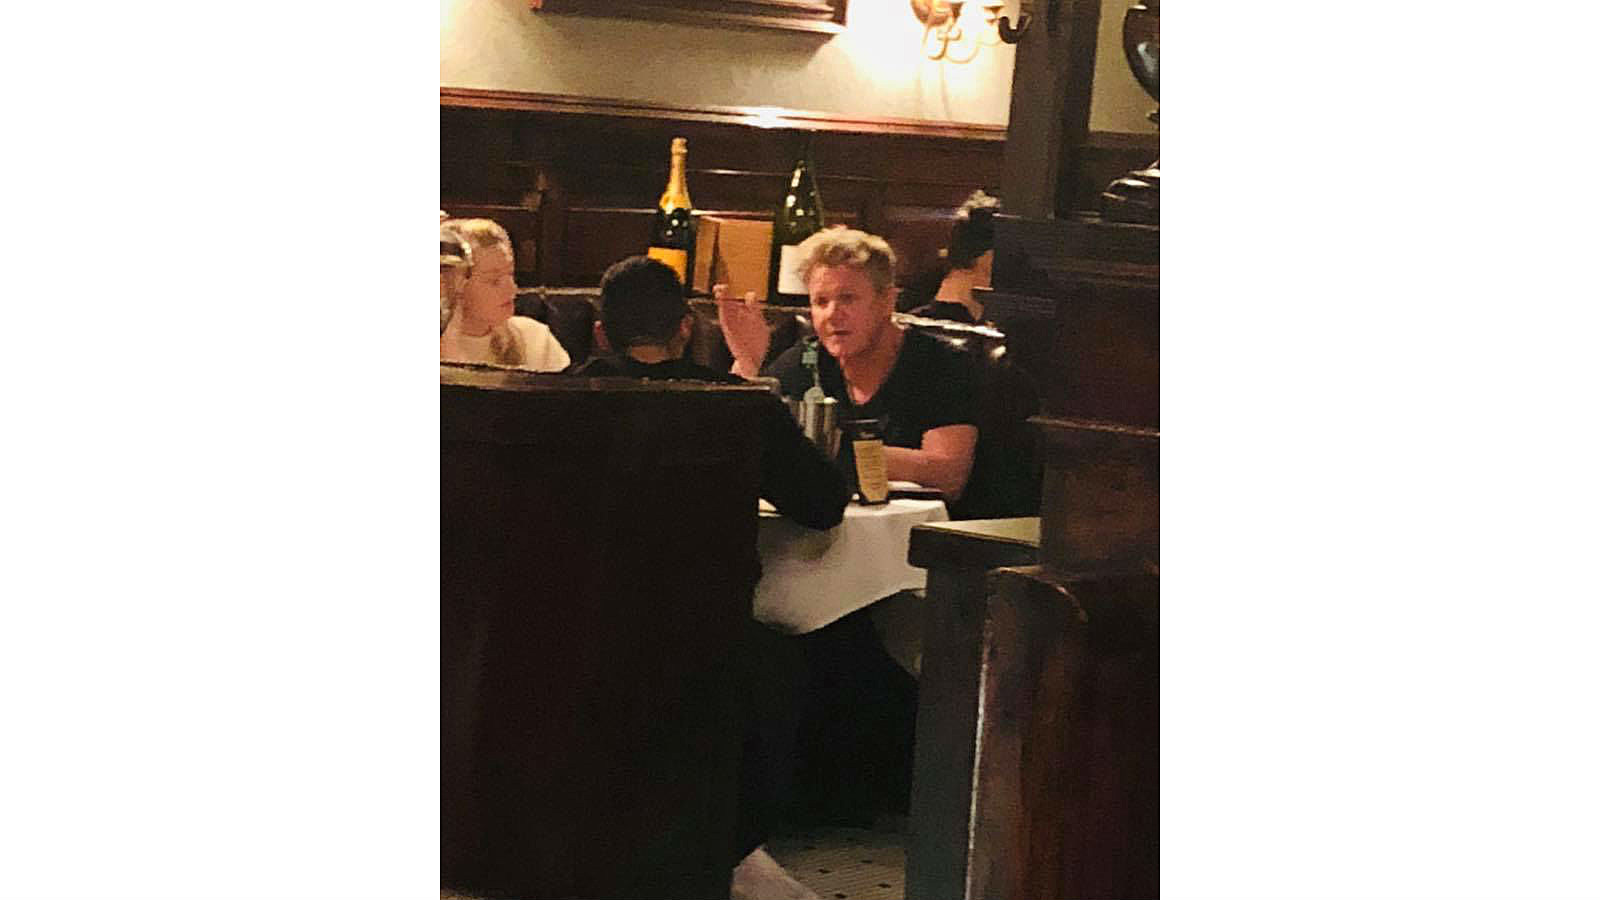 Vasis Halloween 2020 Waterbury Chef Gordon Ramsey Shoots TV Show at Waterbury Restaurant, Dines